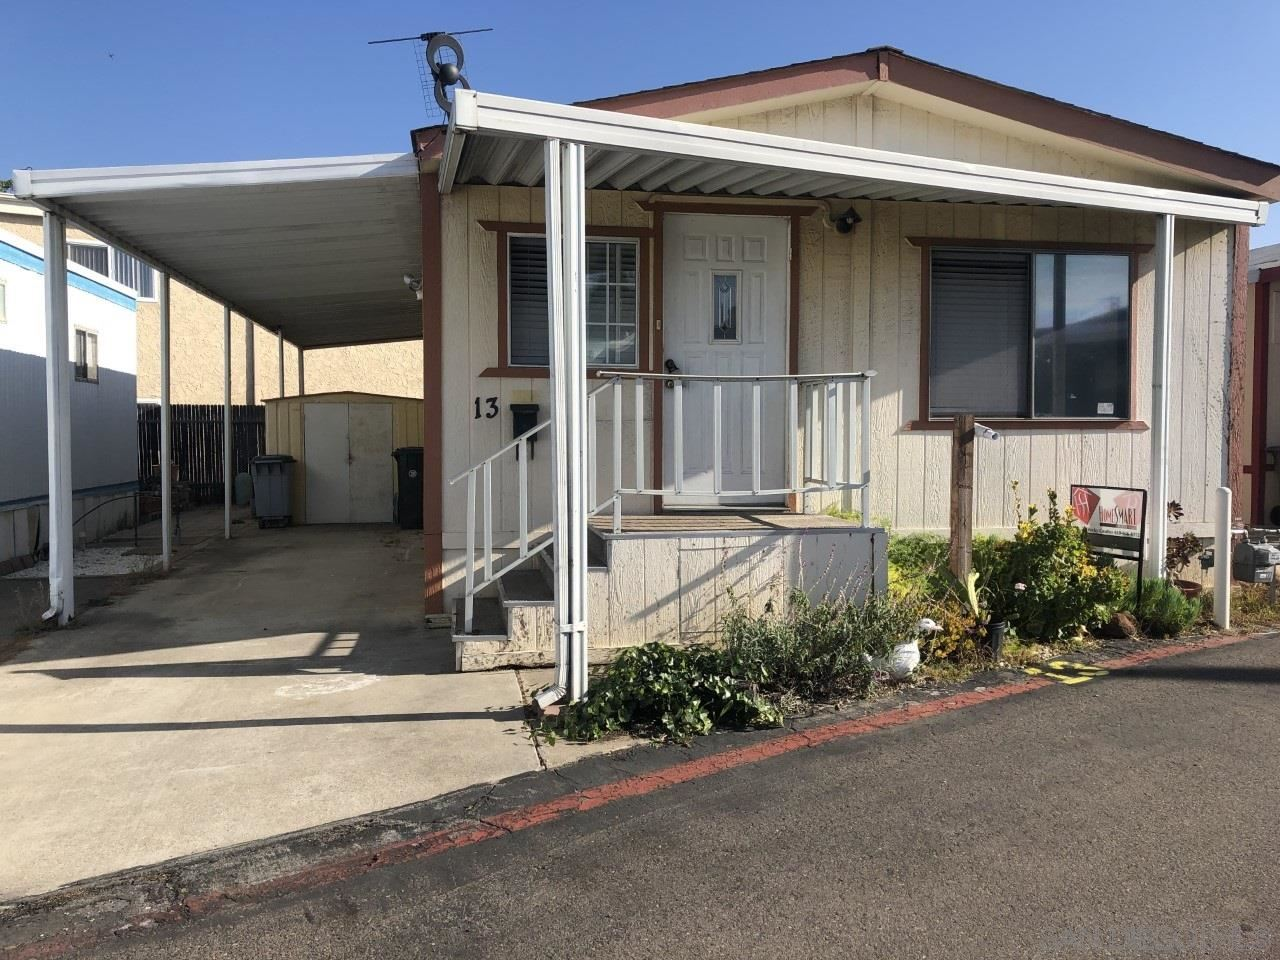 9459 Mission Gorge Road #13, Santee, CA 92071 - MLS#: 210000672